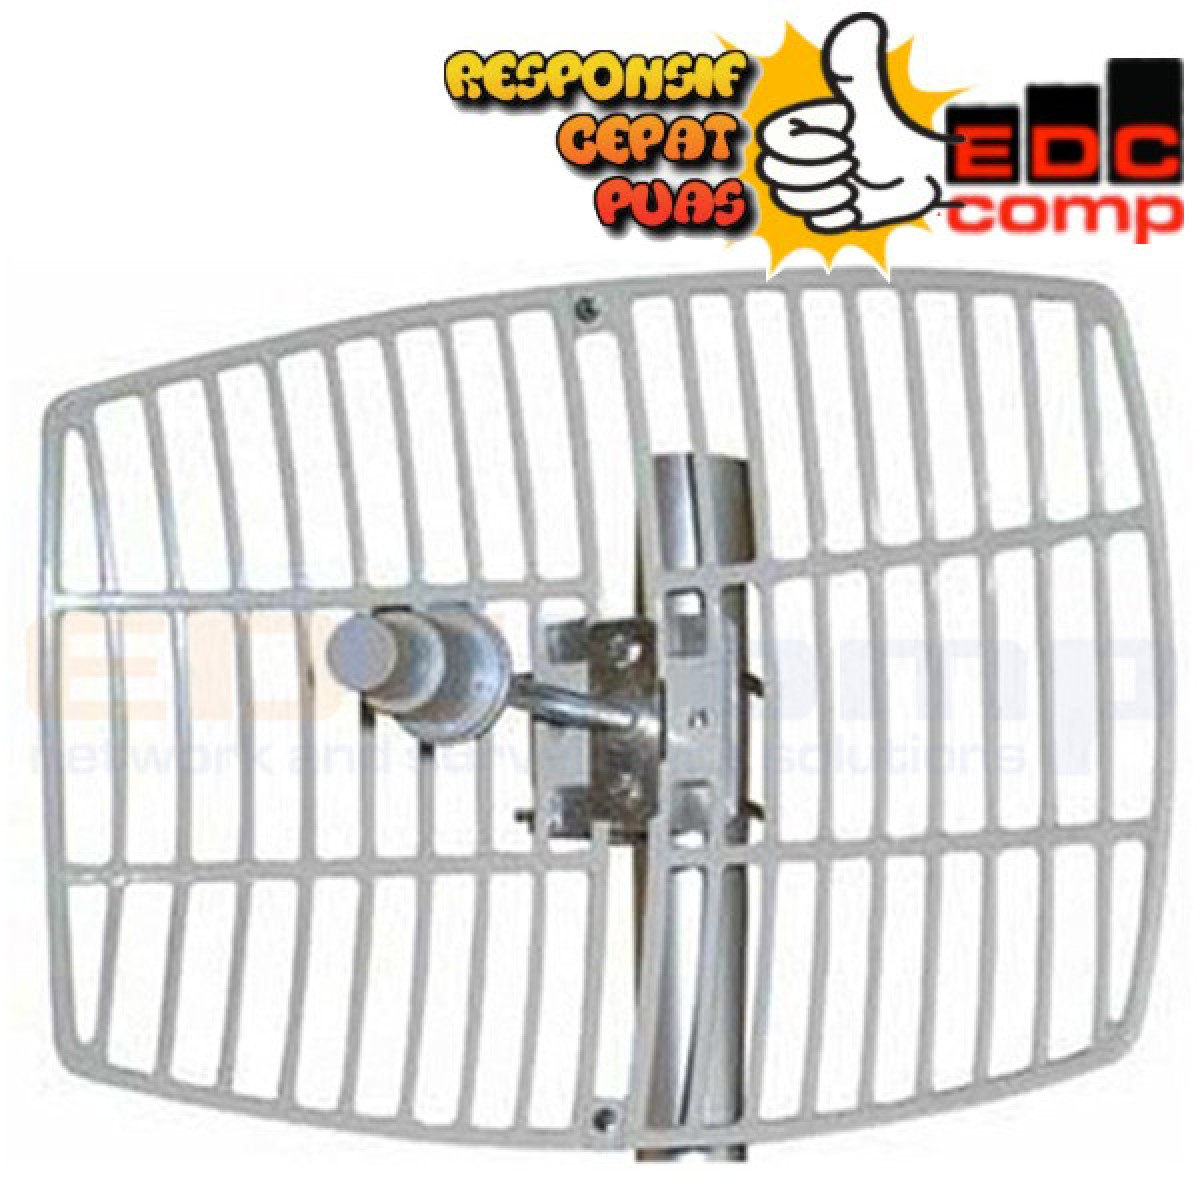 Kenbotong Antenna Antena Grid KBT 5,8Ghz 27dBi TDJ-5800SPL6 - EdcComp